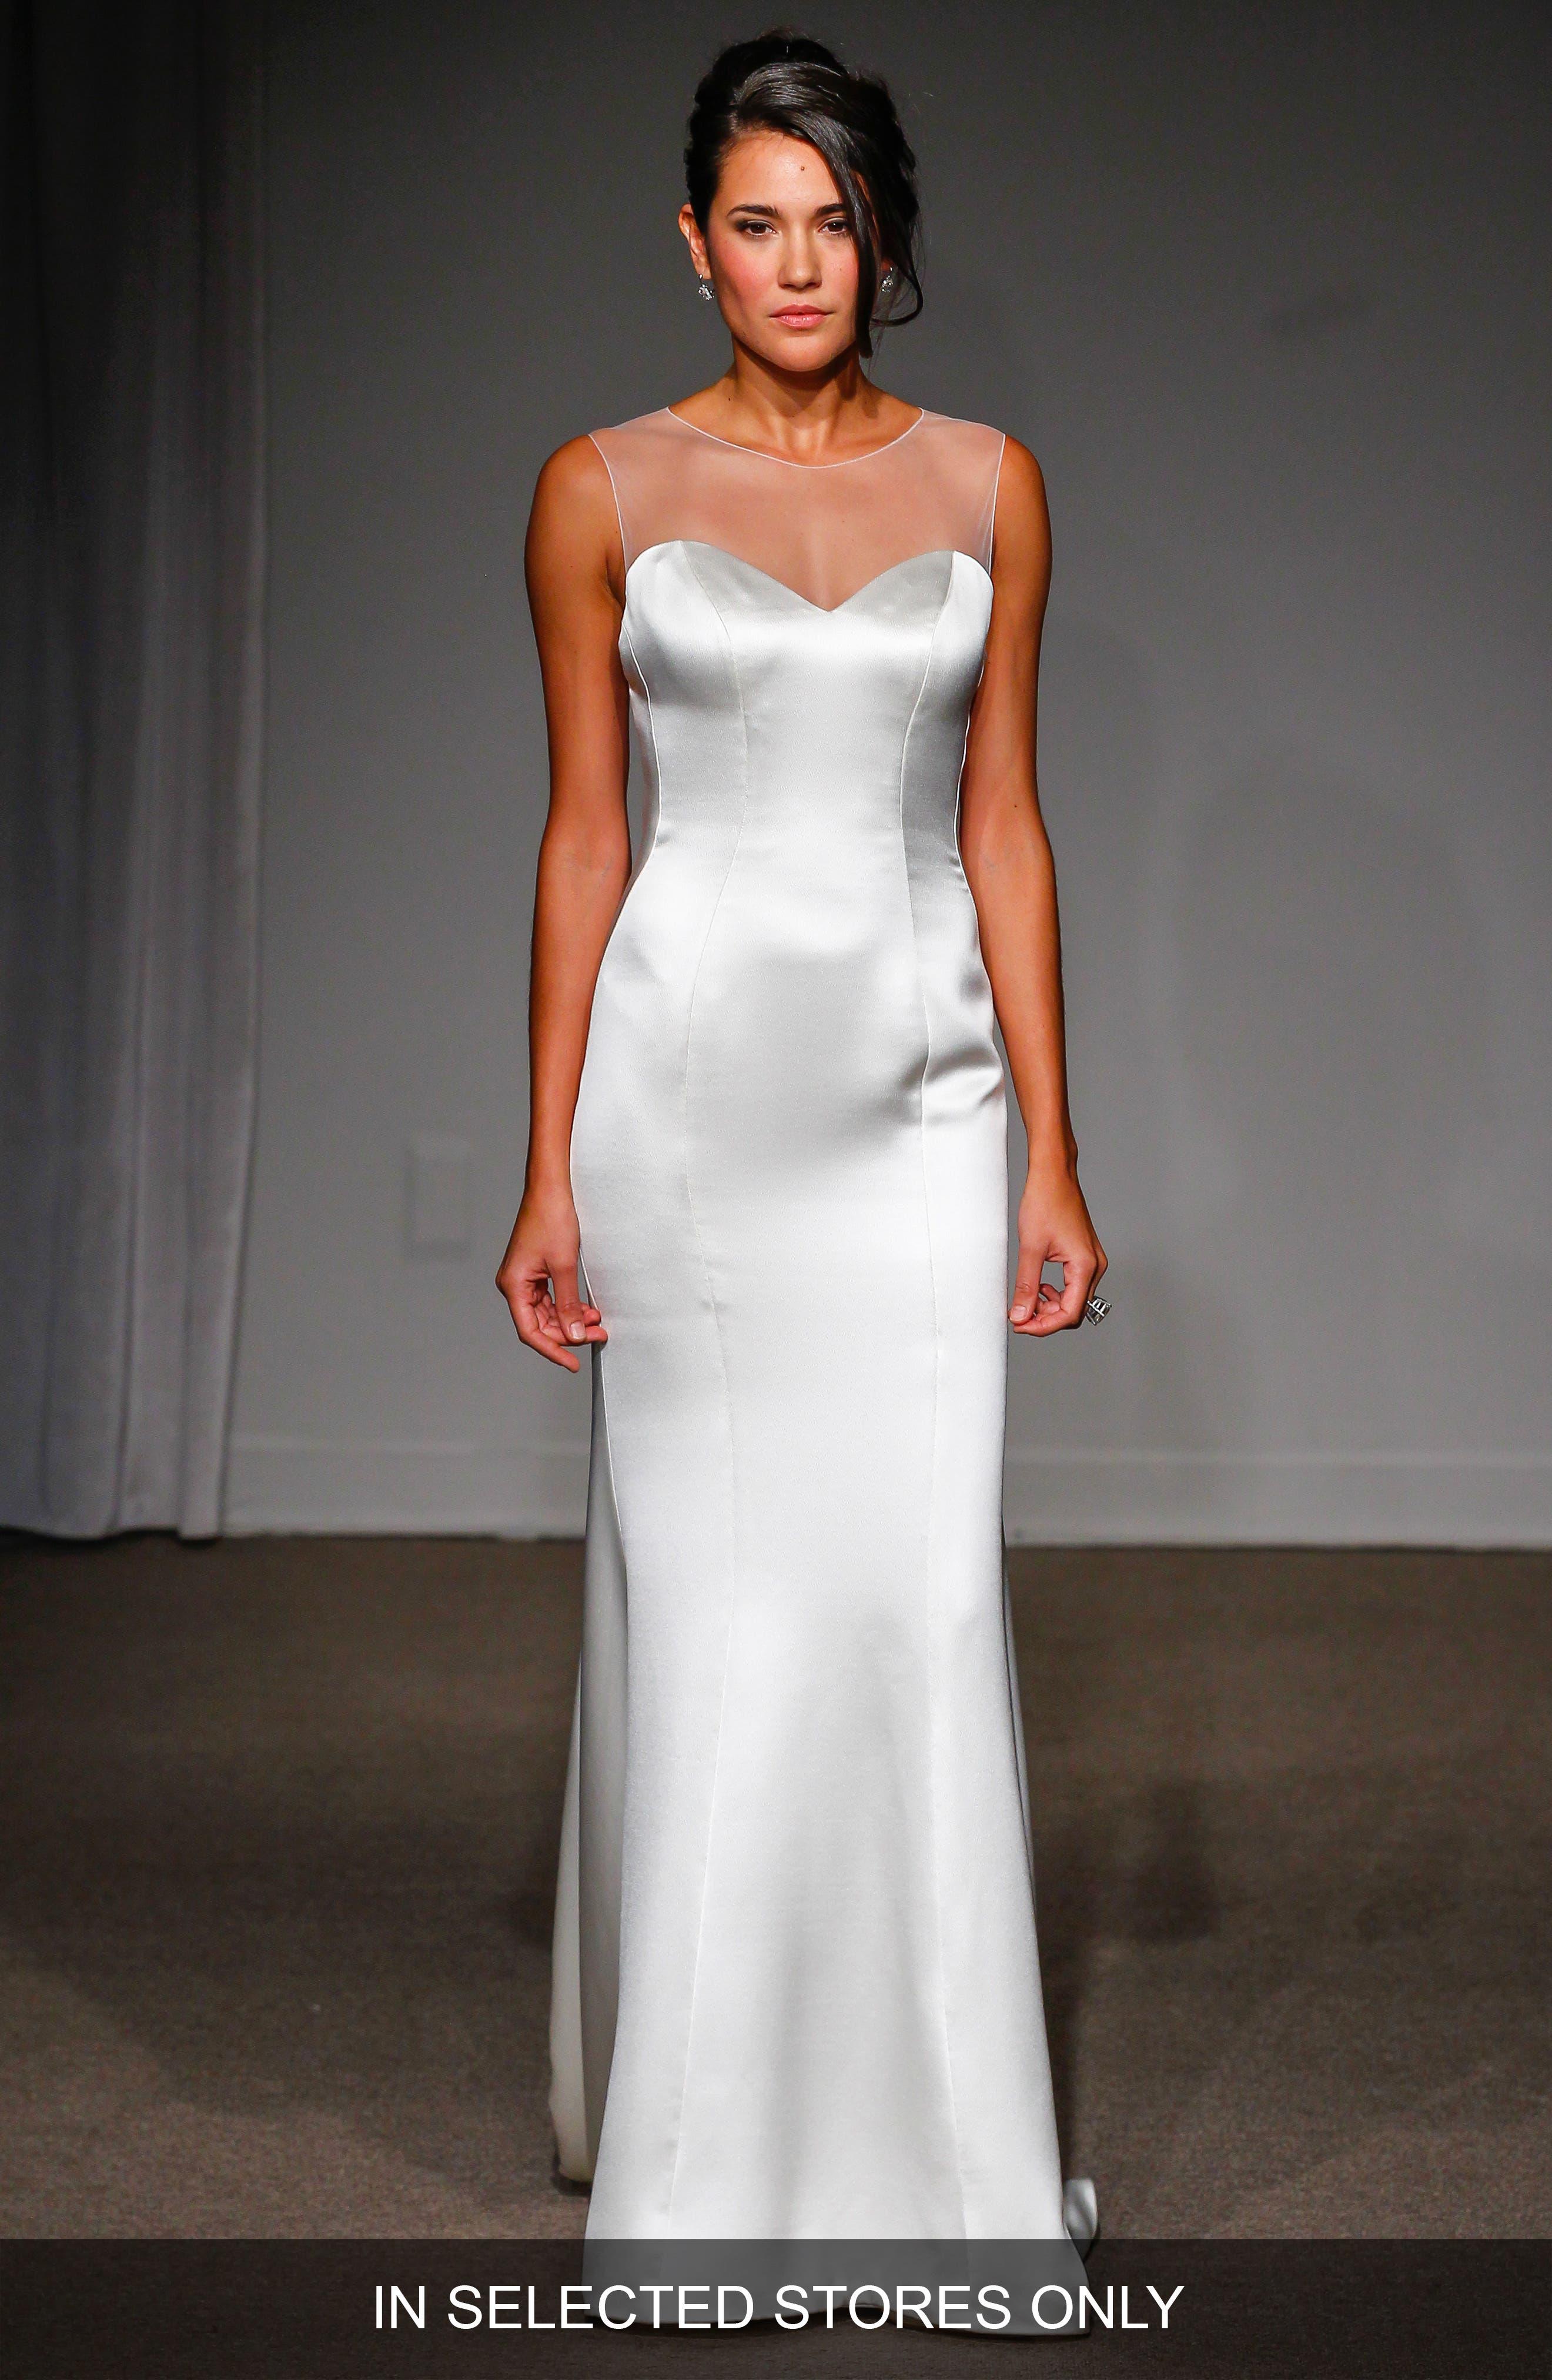 Nicole Illusion Neck Satin A-Line Gown,                             Alternate thumbnail 2, color,                             100